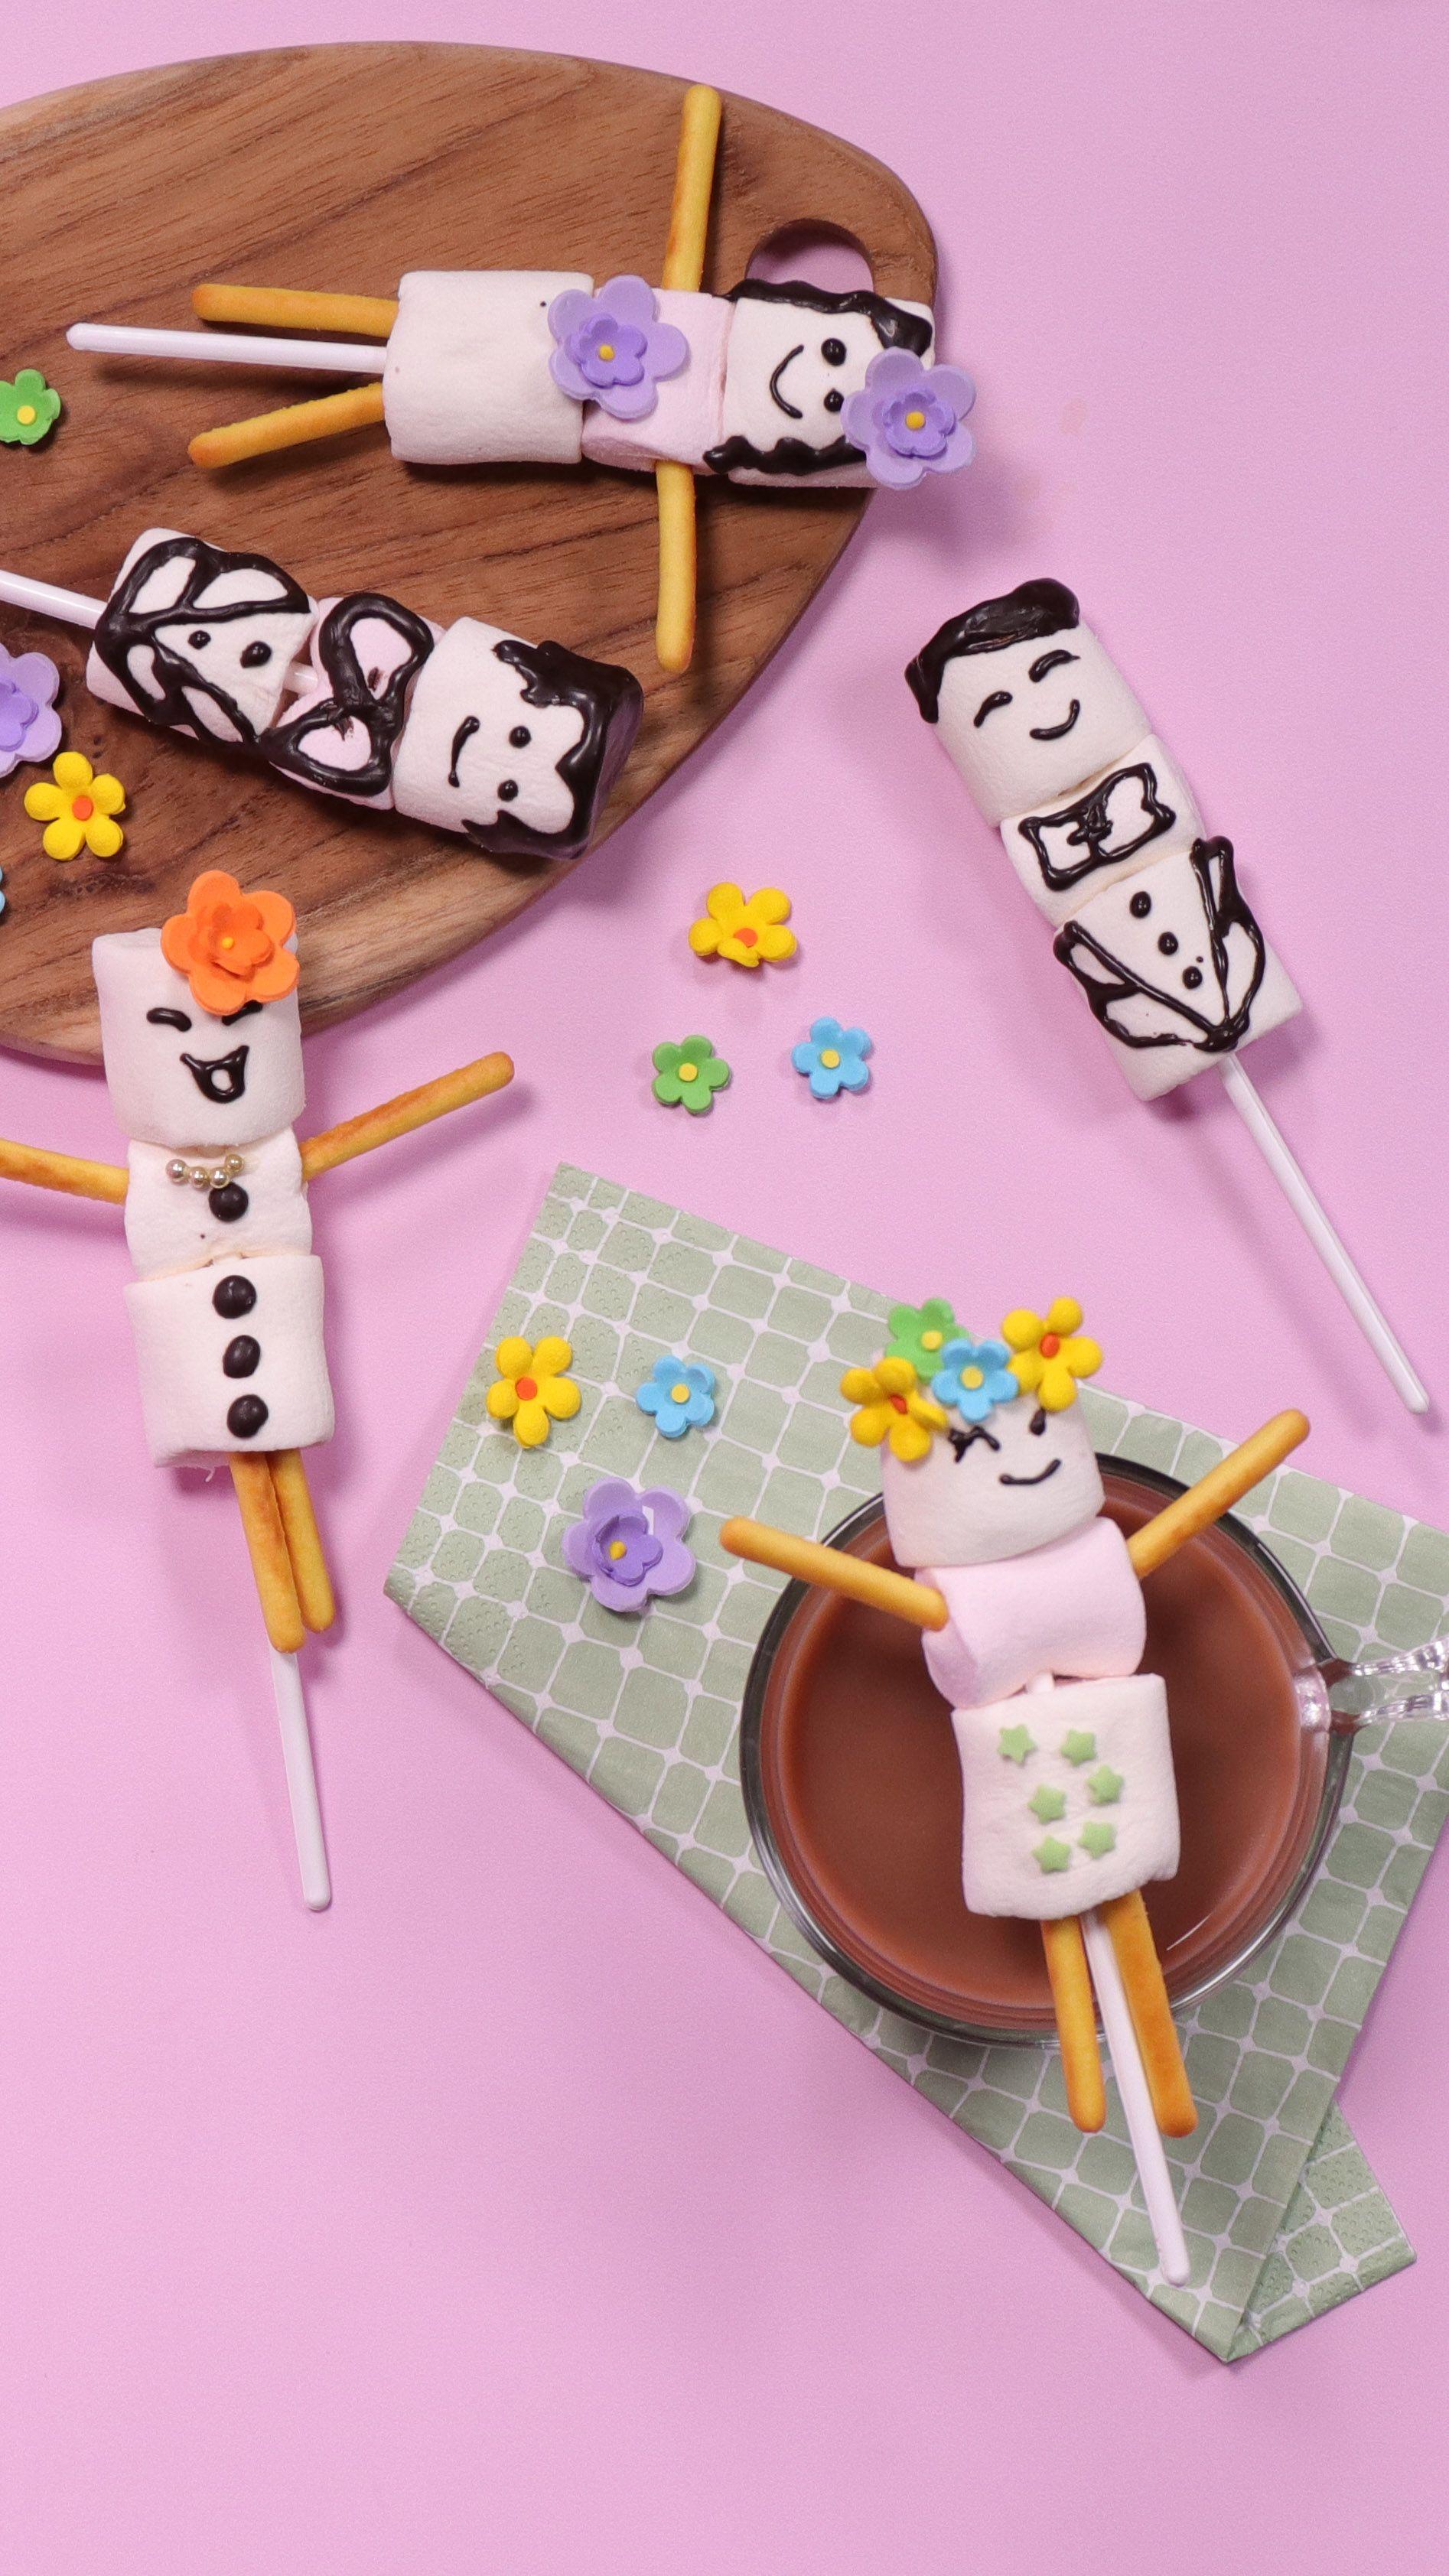 Resep Marshmallow Pop Resep Di 2020 Marshmallow Pops Marshmallow Resep Anak